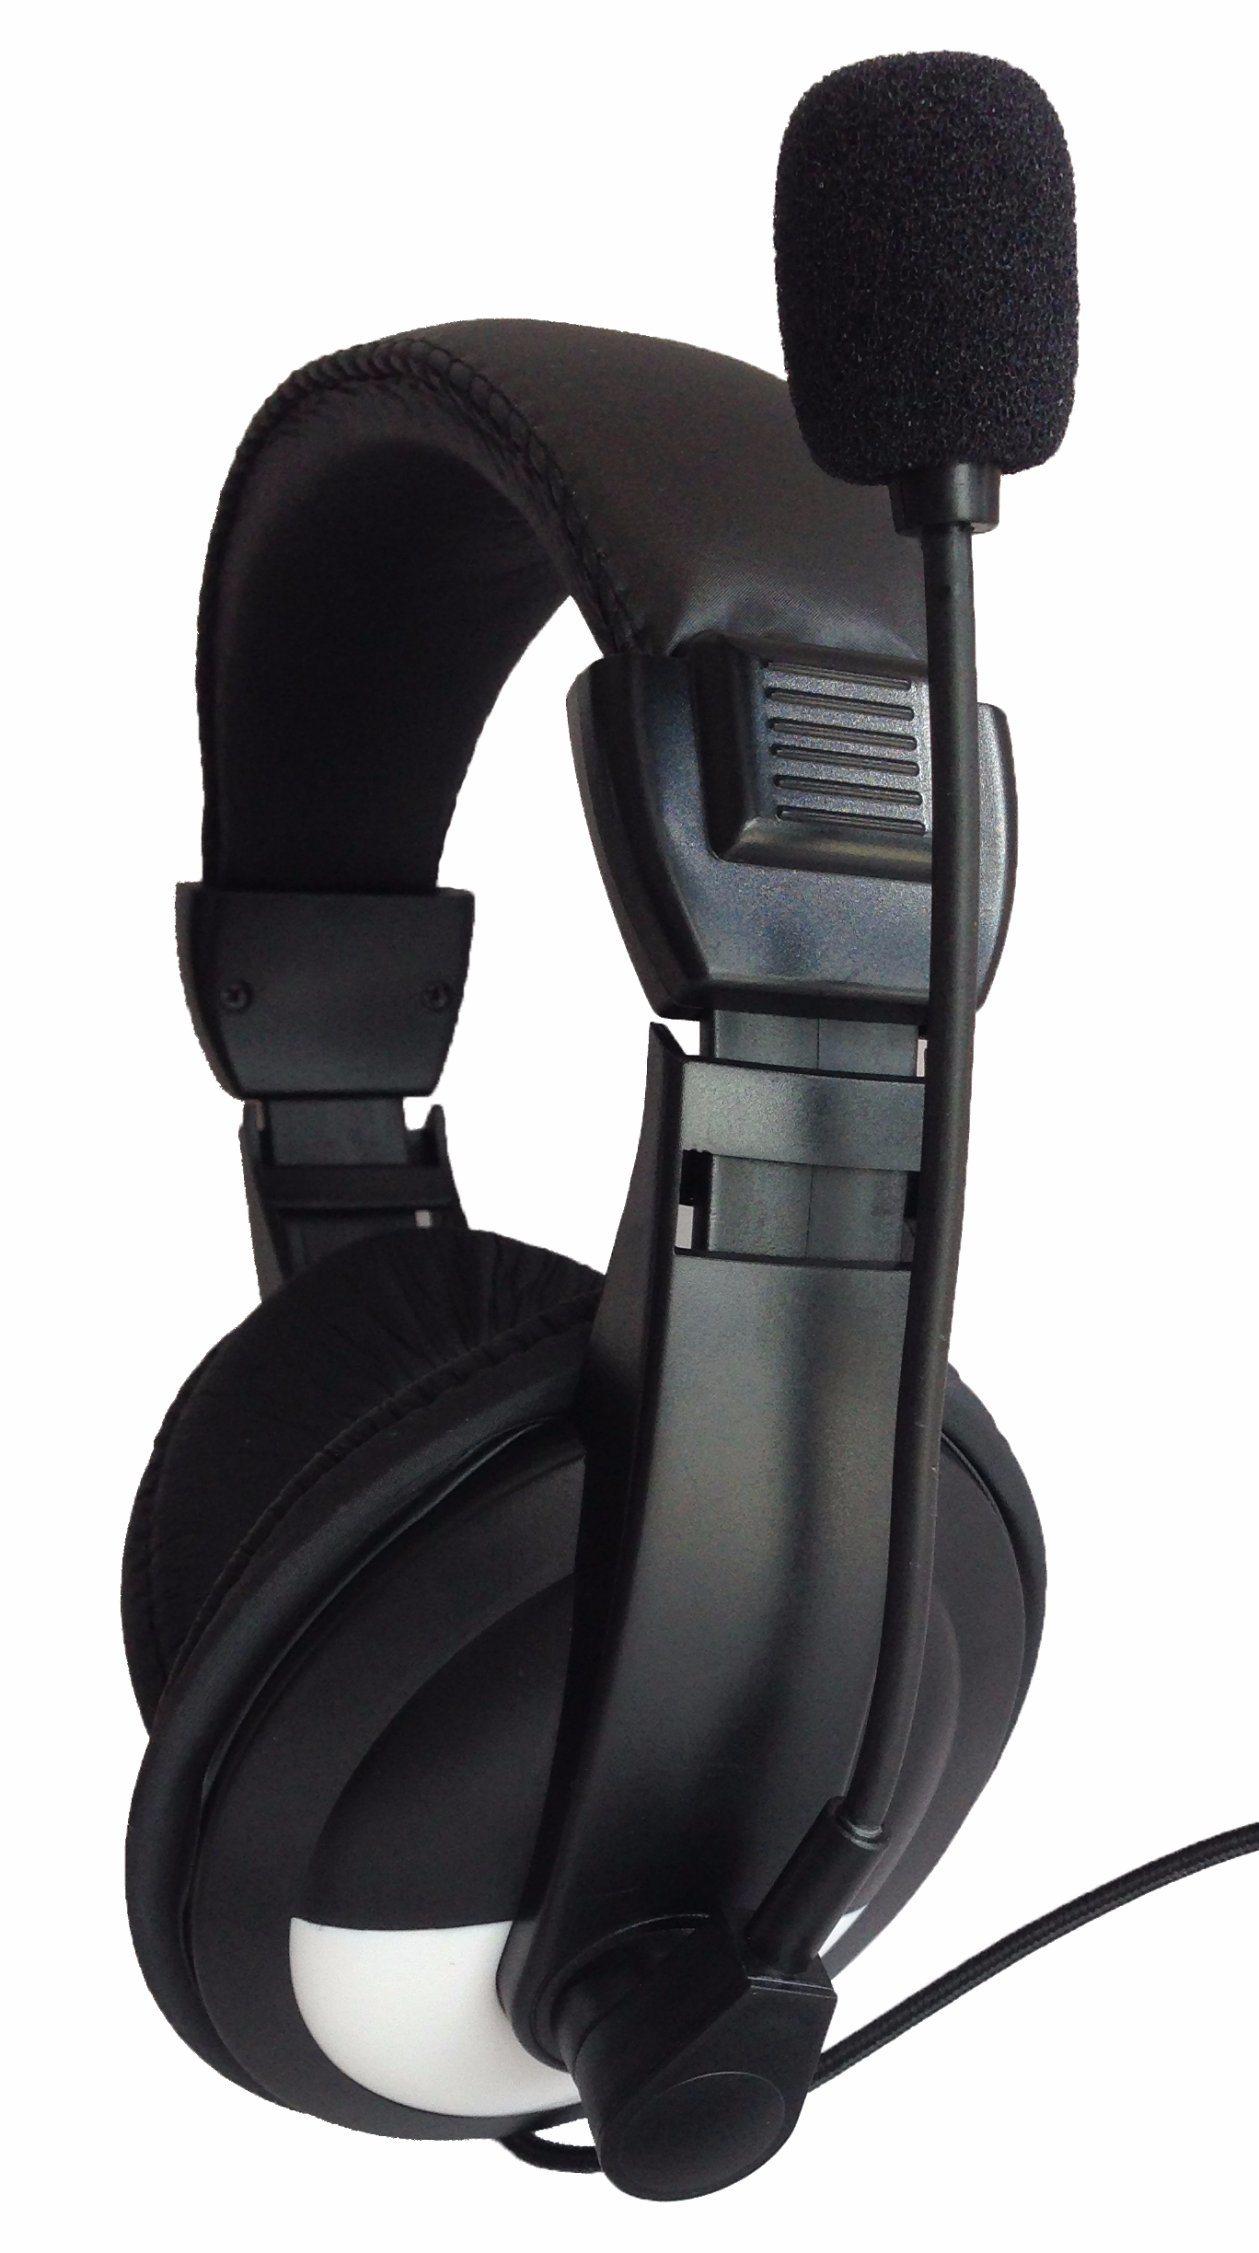 Headphones with Microphone for Smartphones MP3/4 Laptop Computers Tab Let MacBook Folding Gaming Earphones